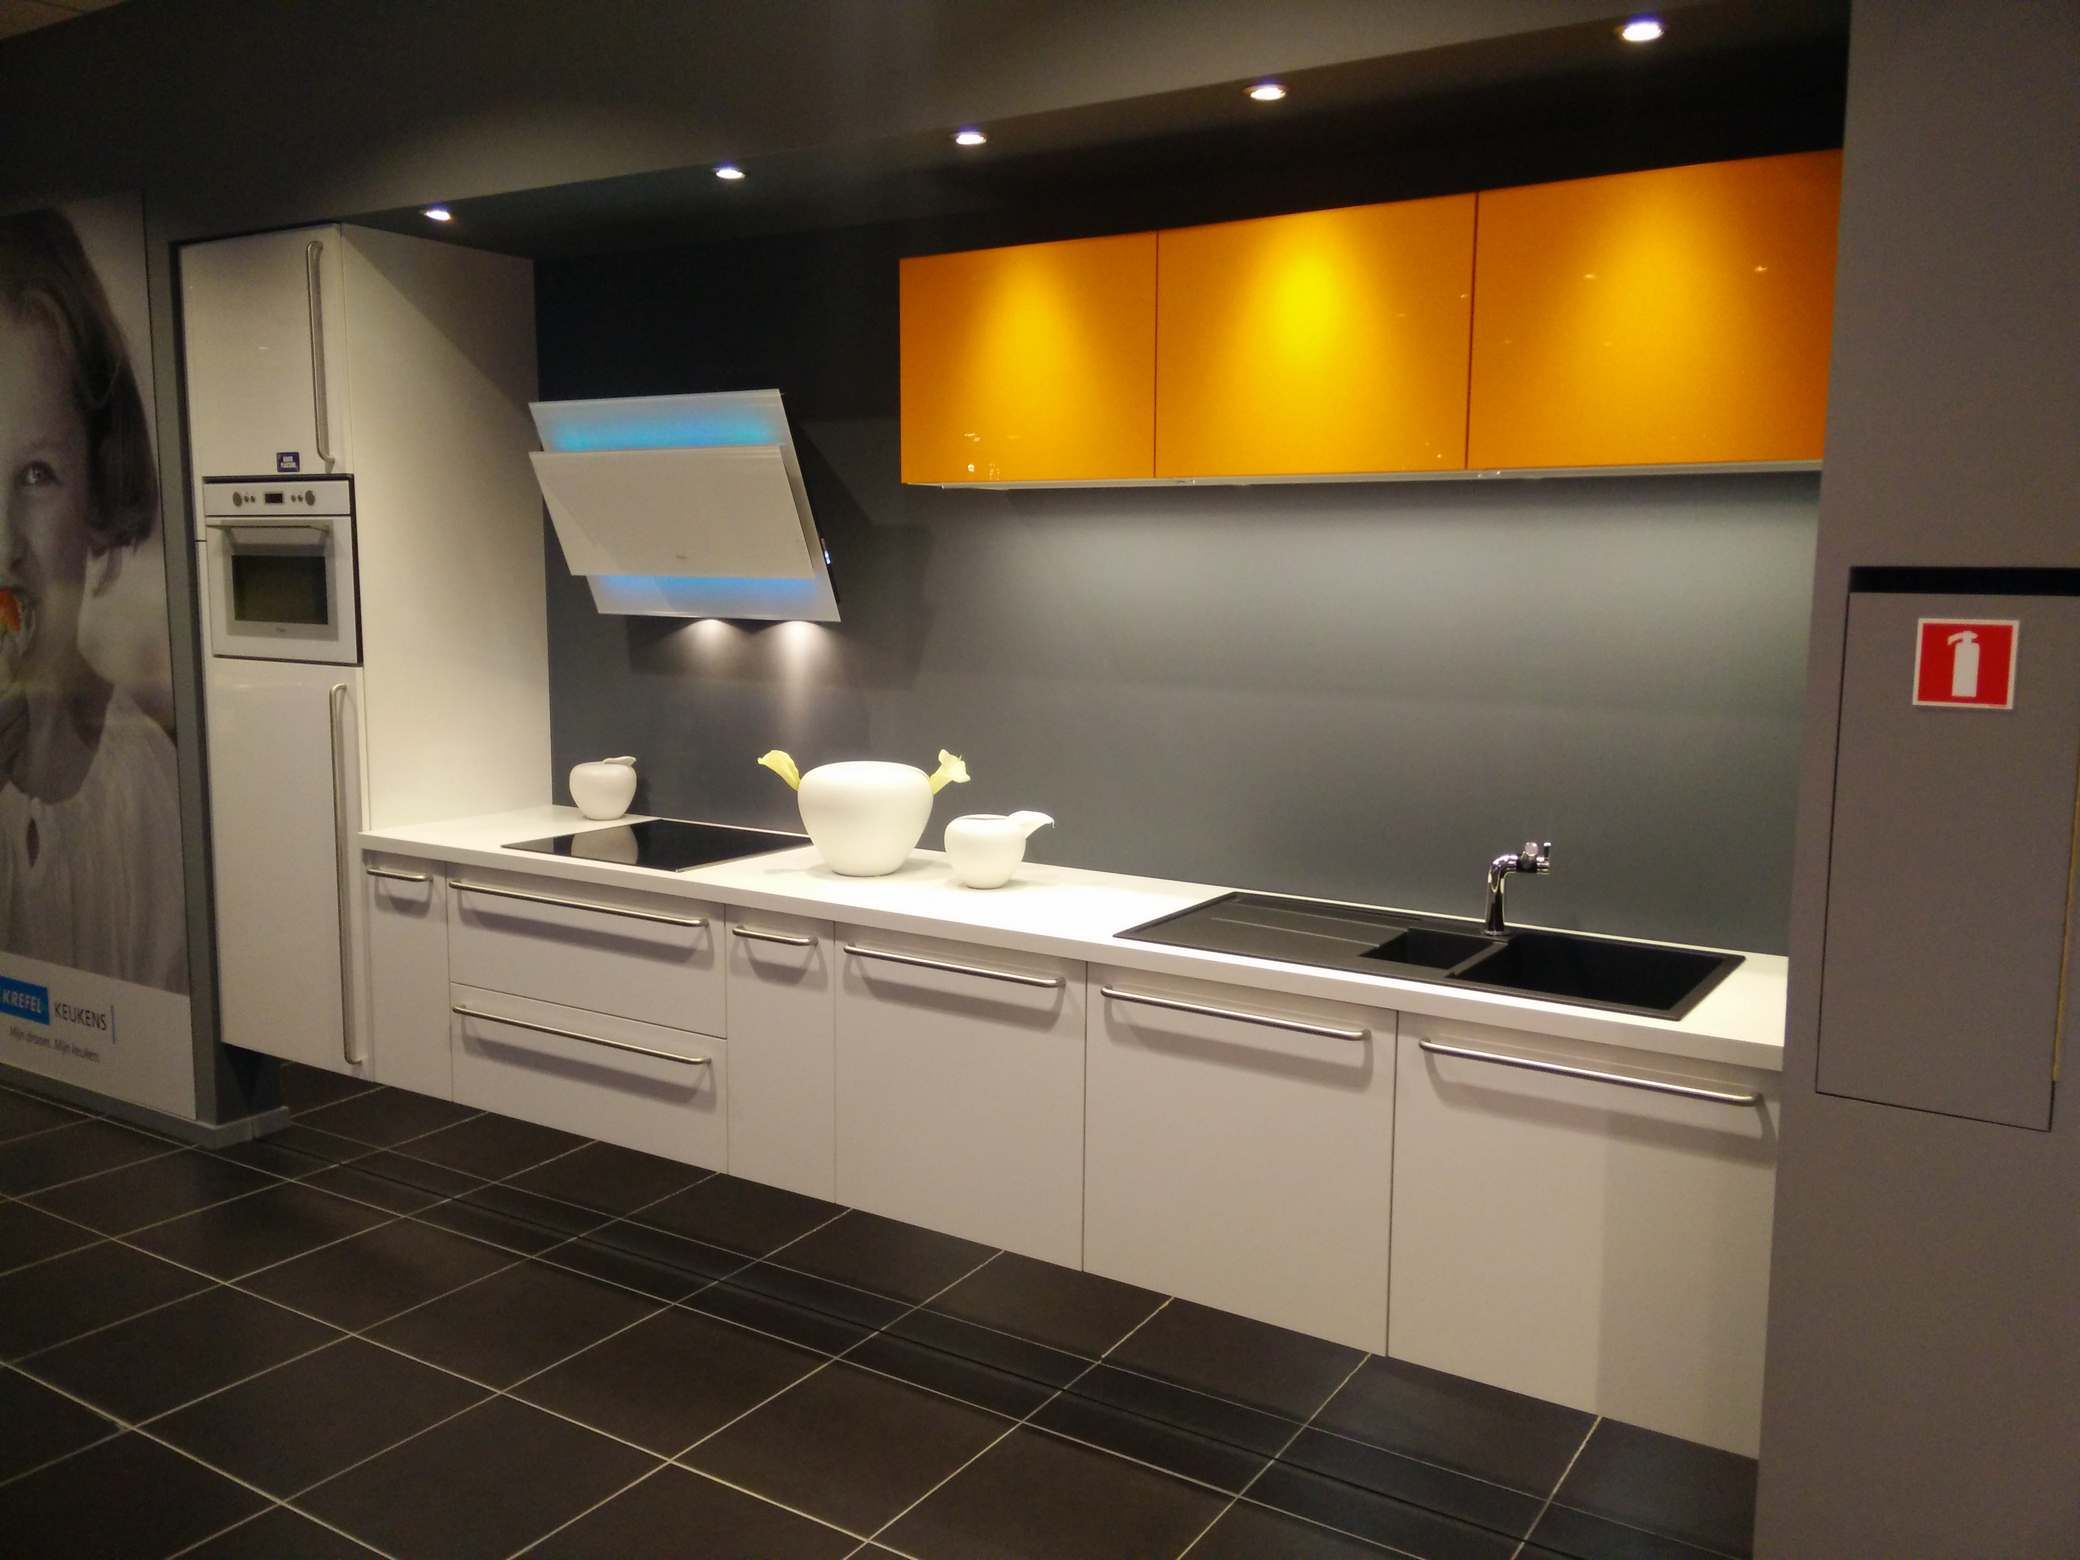 Beda Keukens Showroom : Keukens showroom siematic keukens in duitsland siematic keuken